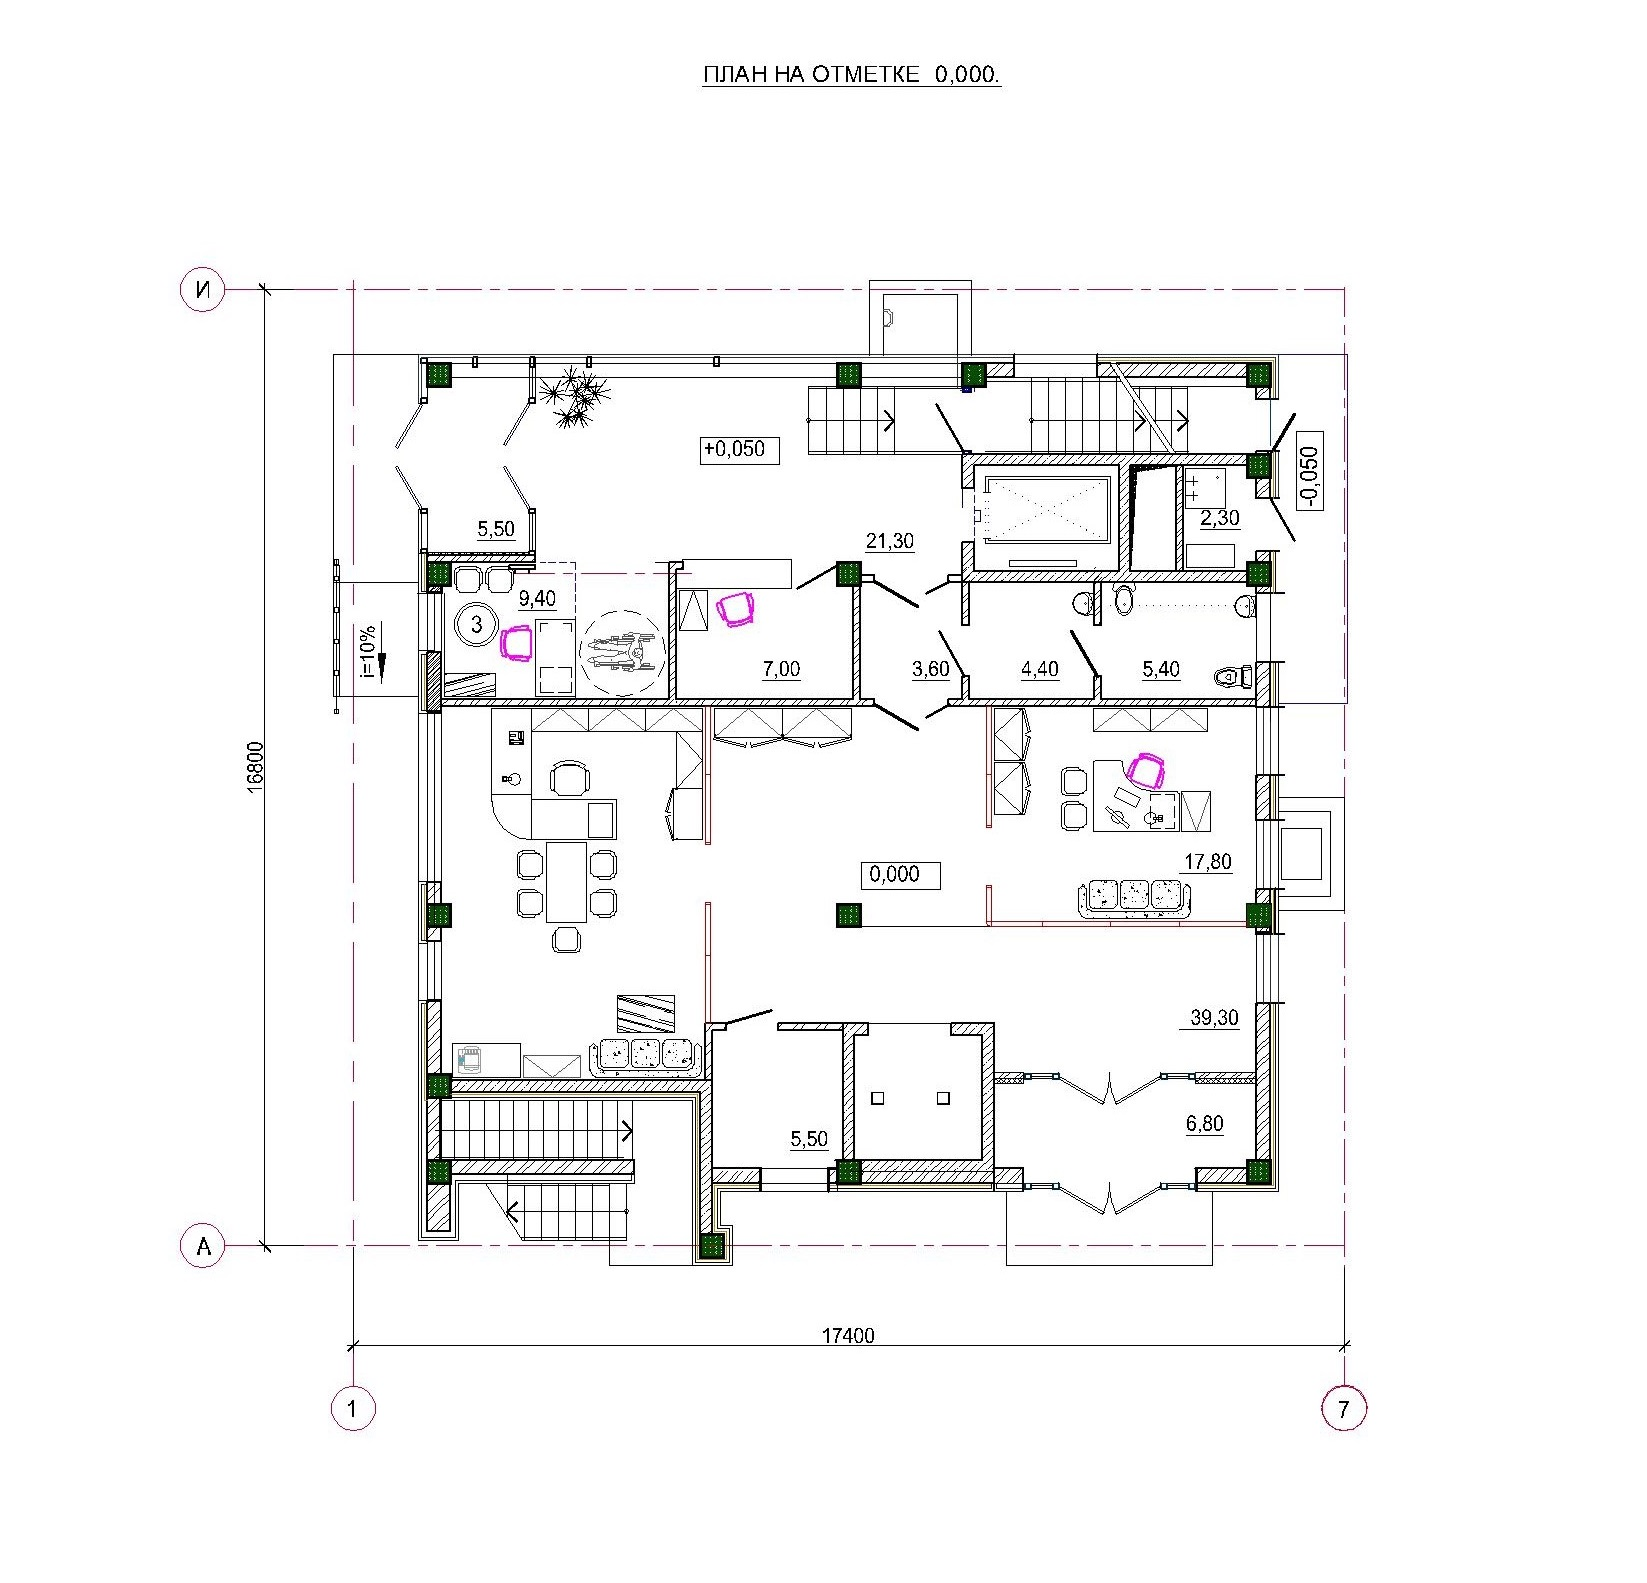 Проект административного здания. План на отм. 0.000